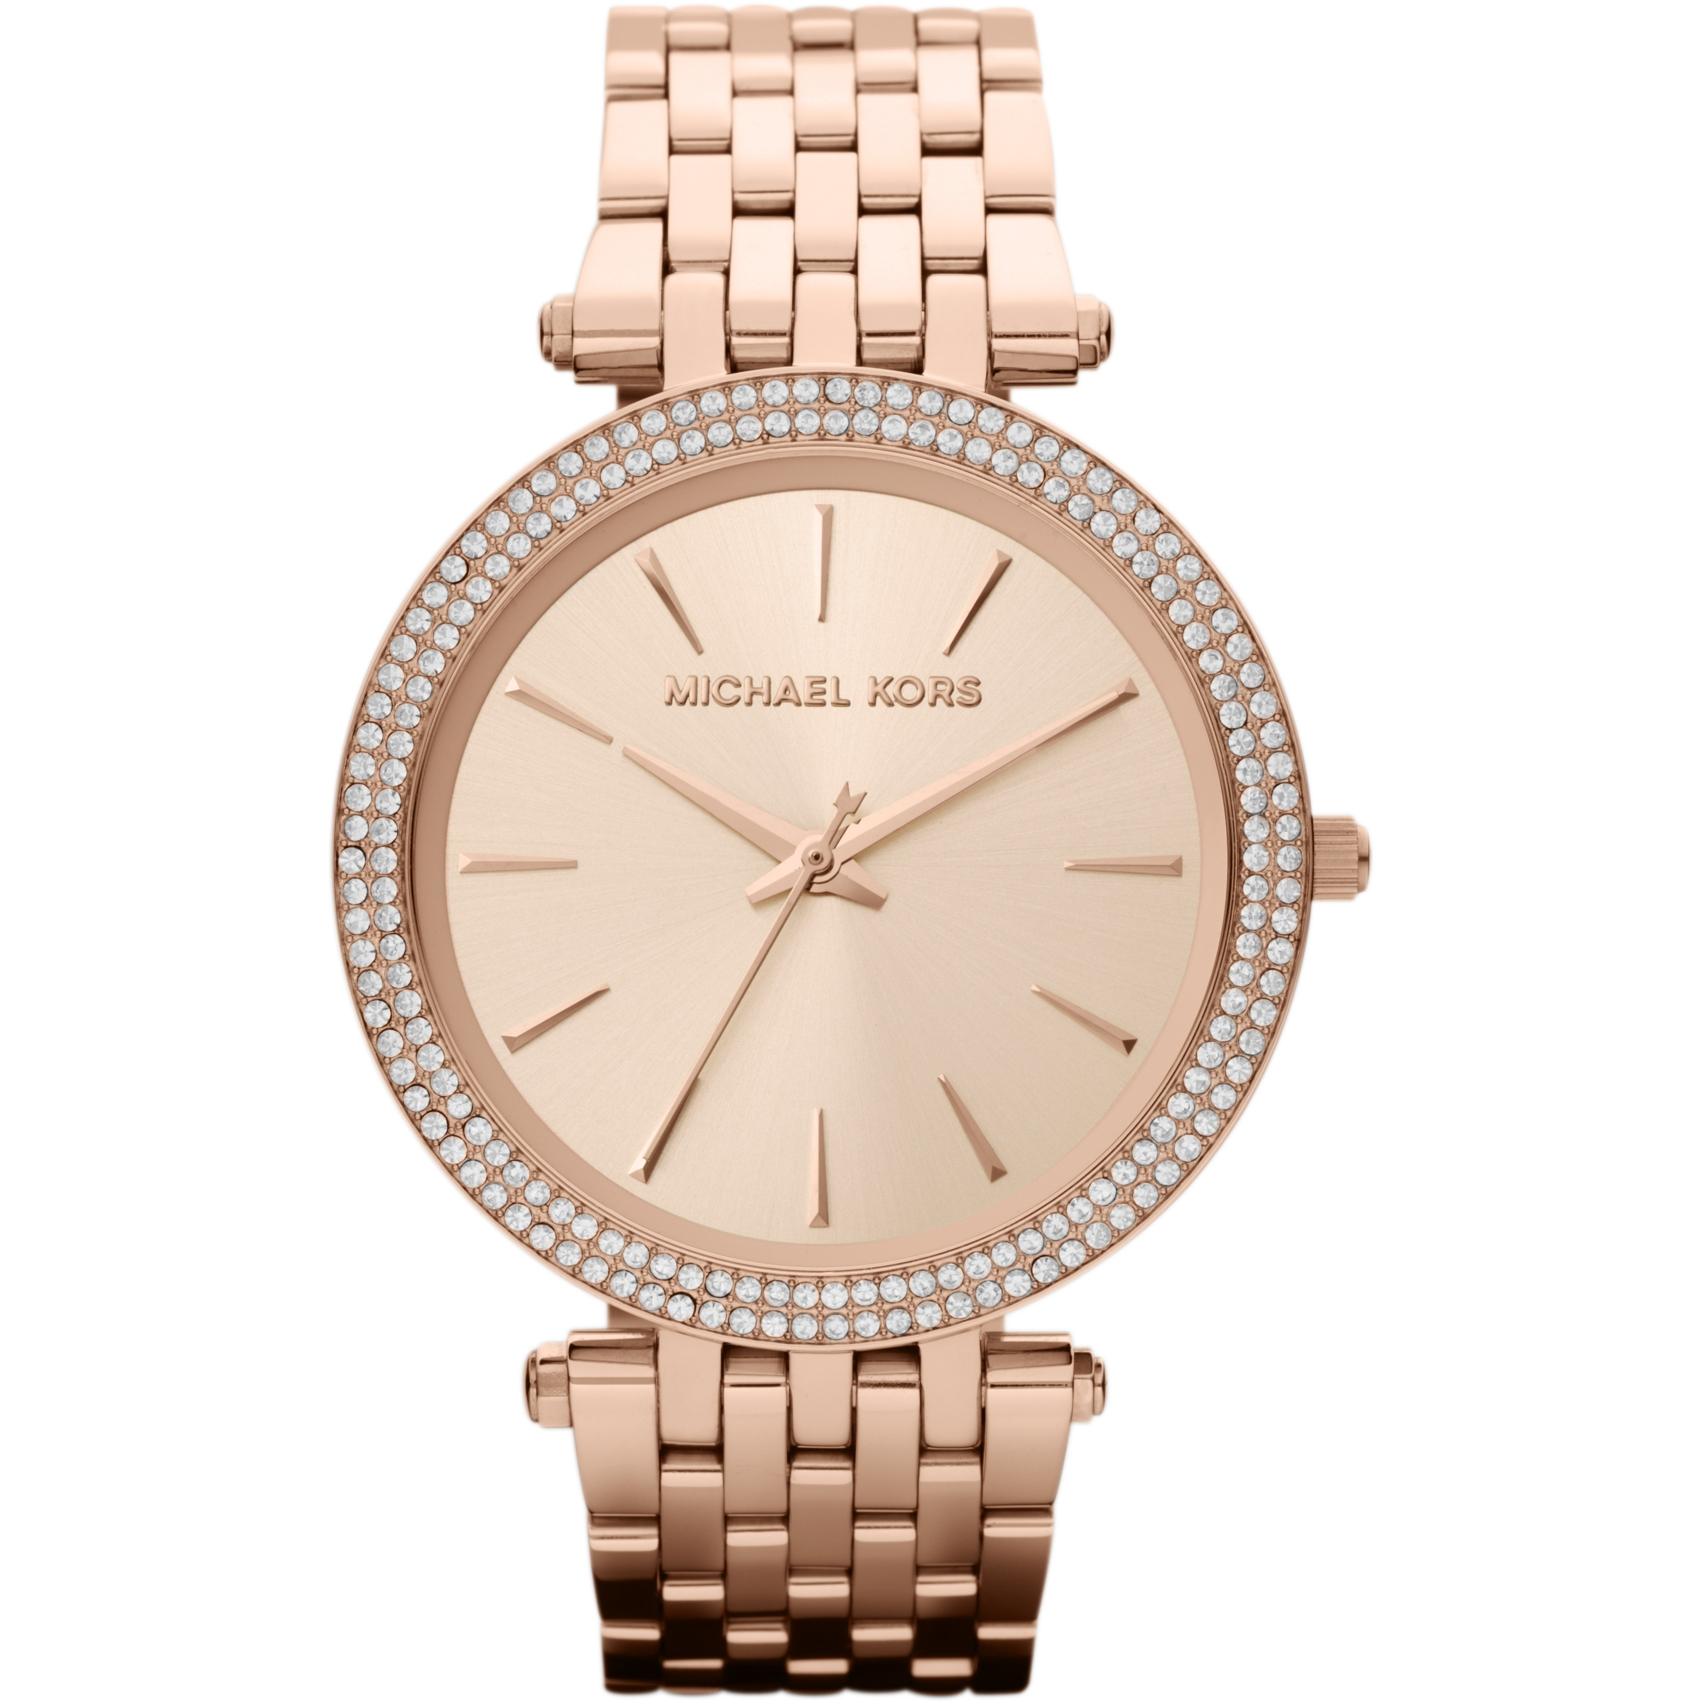 9693e7504a3 Ladies Michael Kors Darci Watch (MK3192) | WatchShop.com™